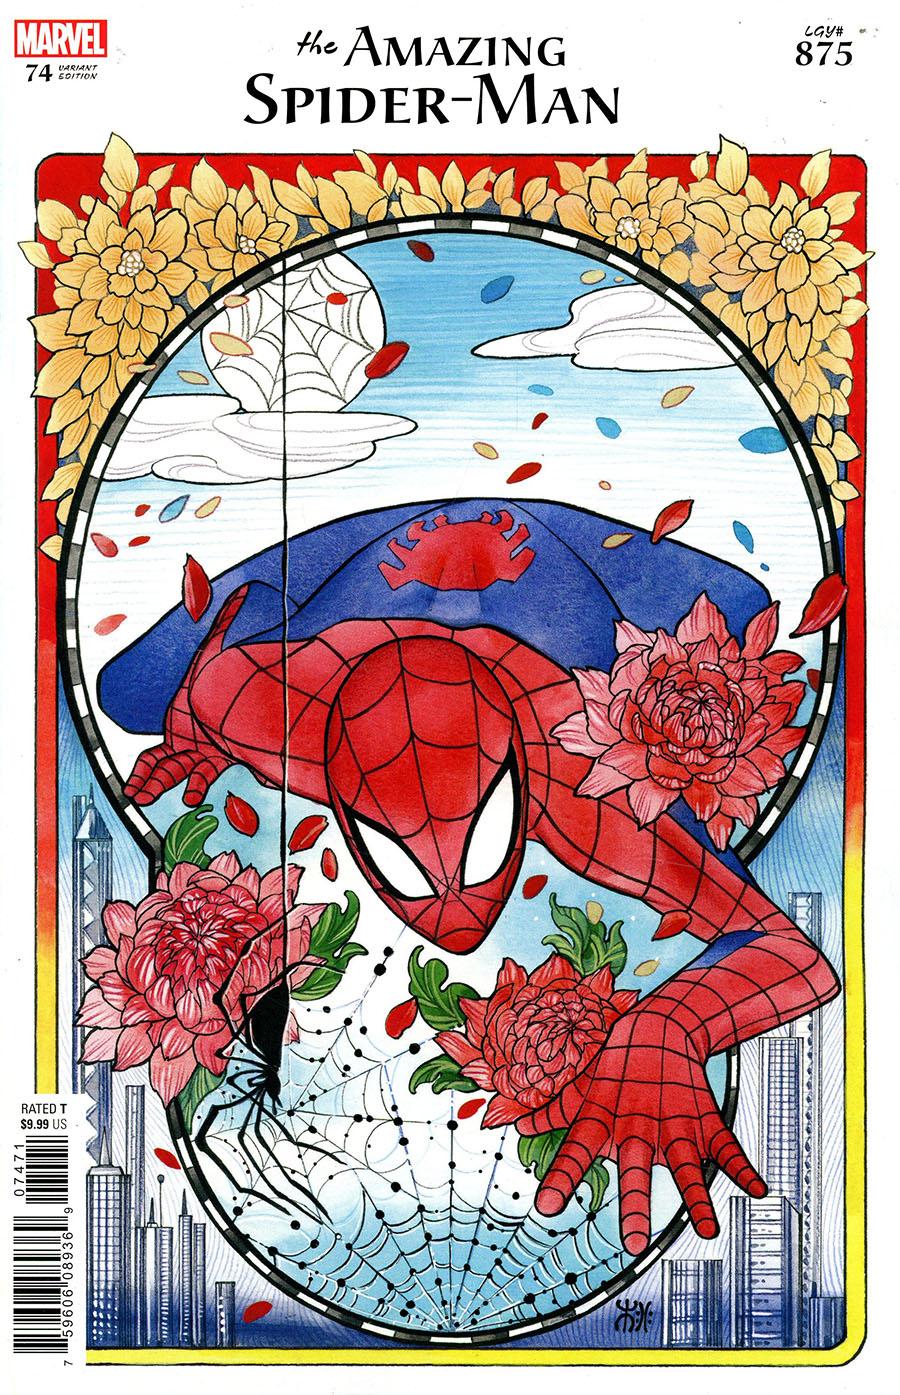 Amazing Spider-Man Vol 5 #74 Cover E Variant Peach Momoko Cover (#875)